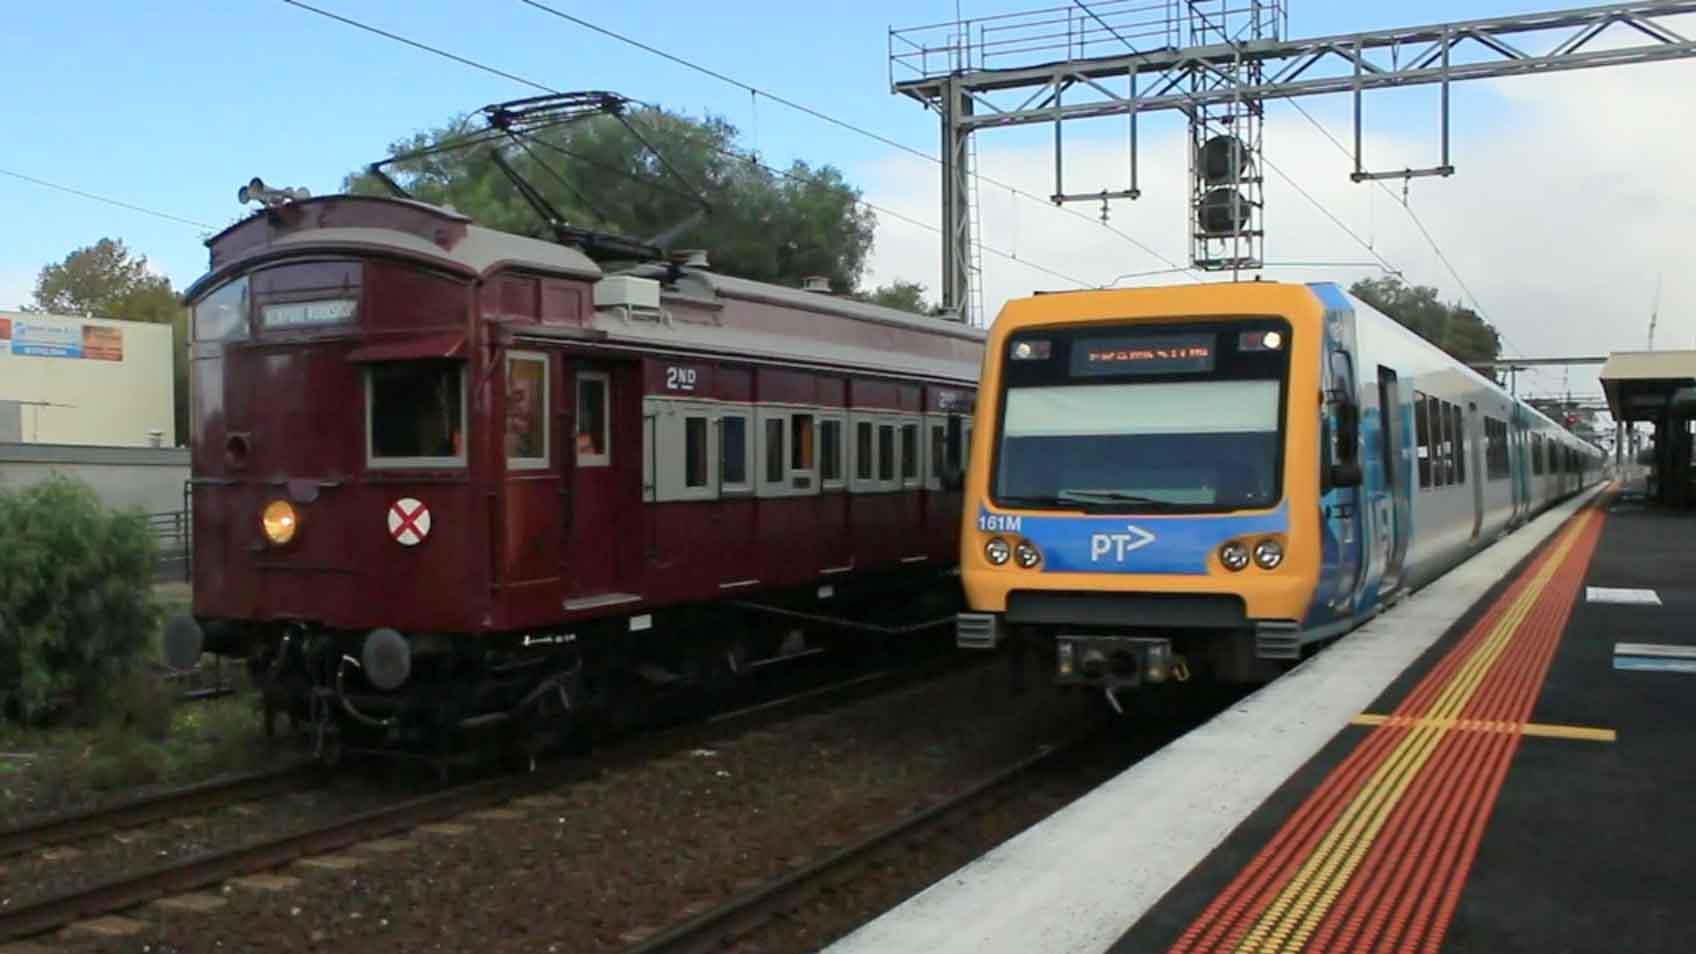 381M-161M--Newport-Sidings-Frankston-via-Southern-Cross-Flinders-Street-Tait-Jordy-Lancaster